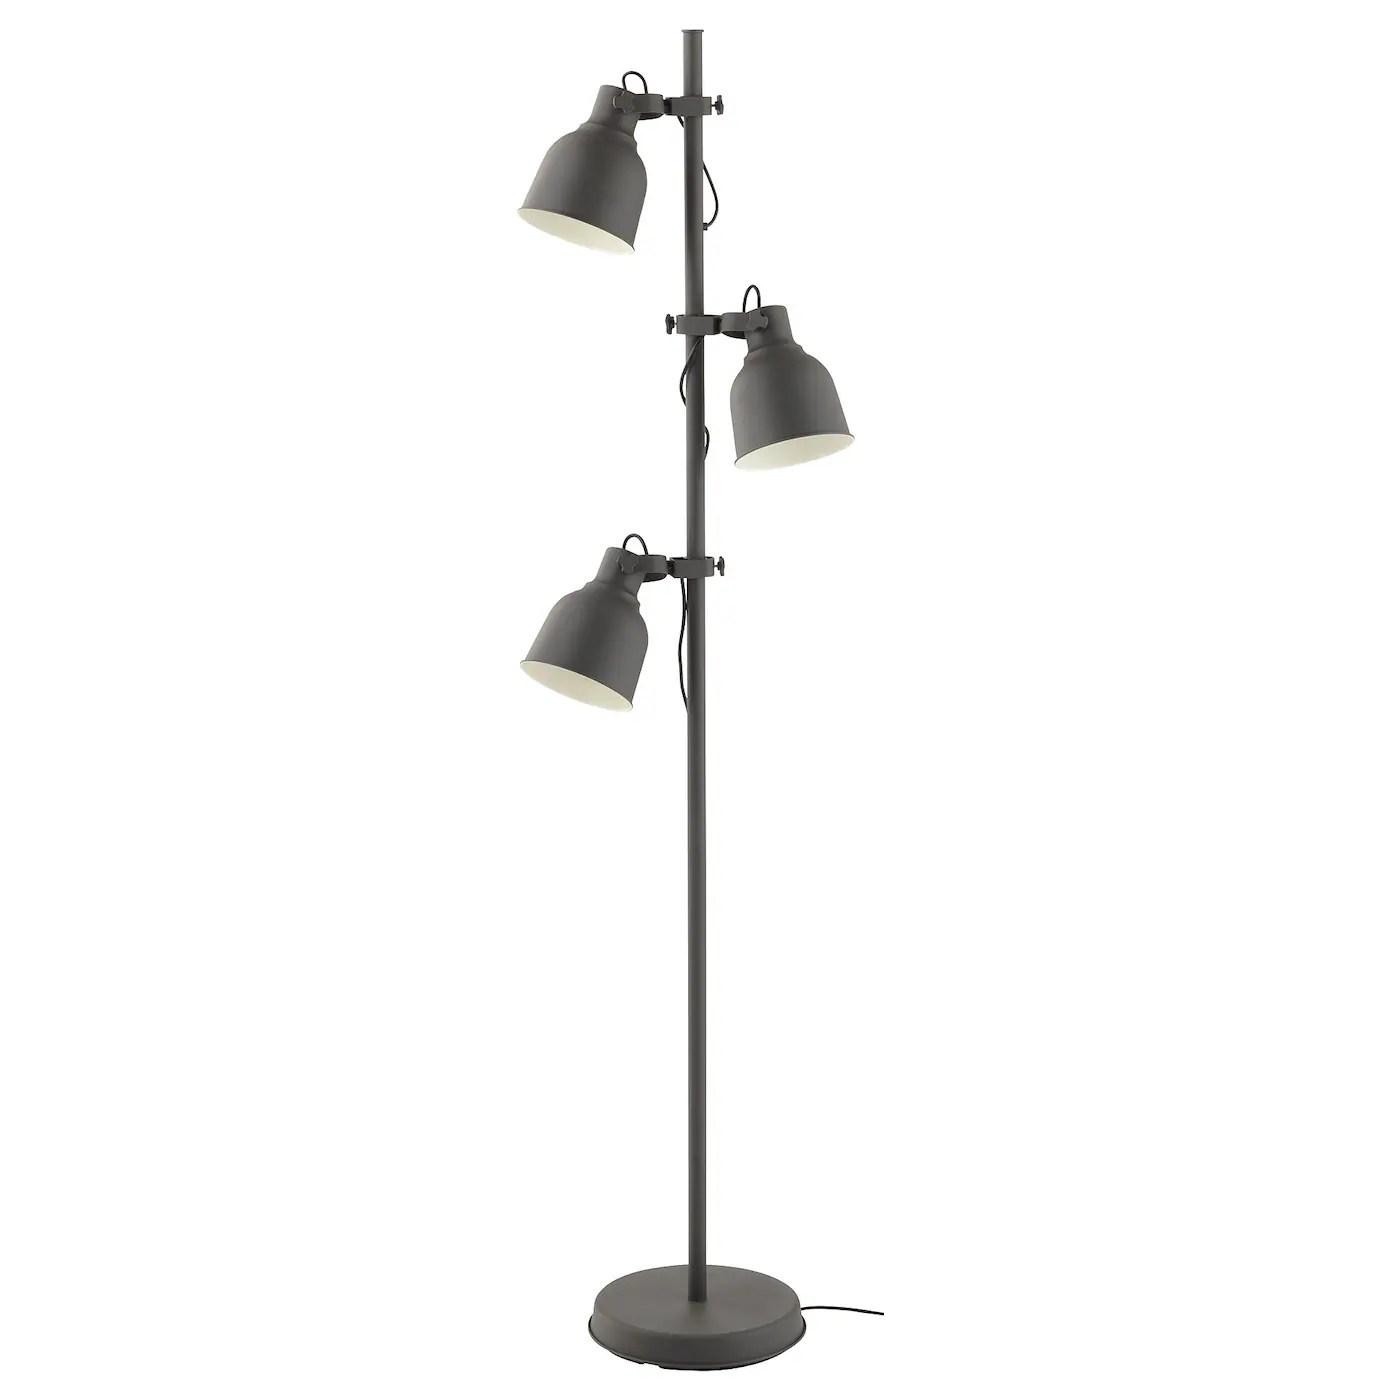 Lampadaire Design Lampadaires Salon Ou Exterieur Ikea